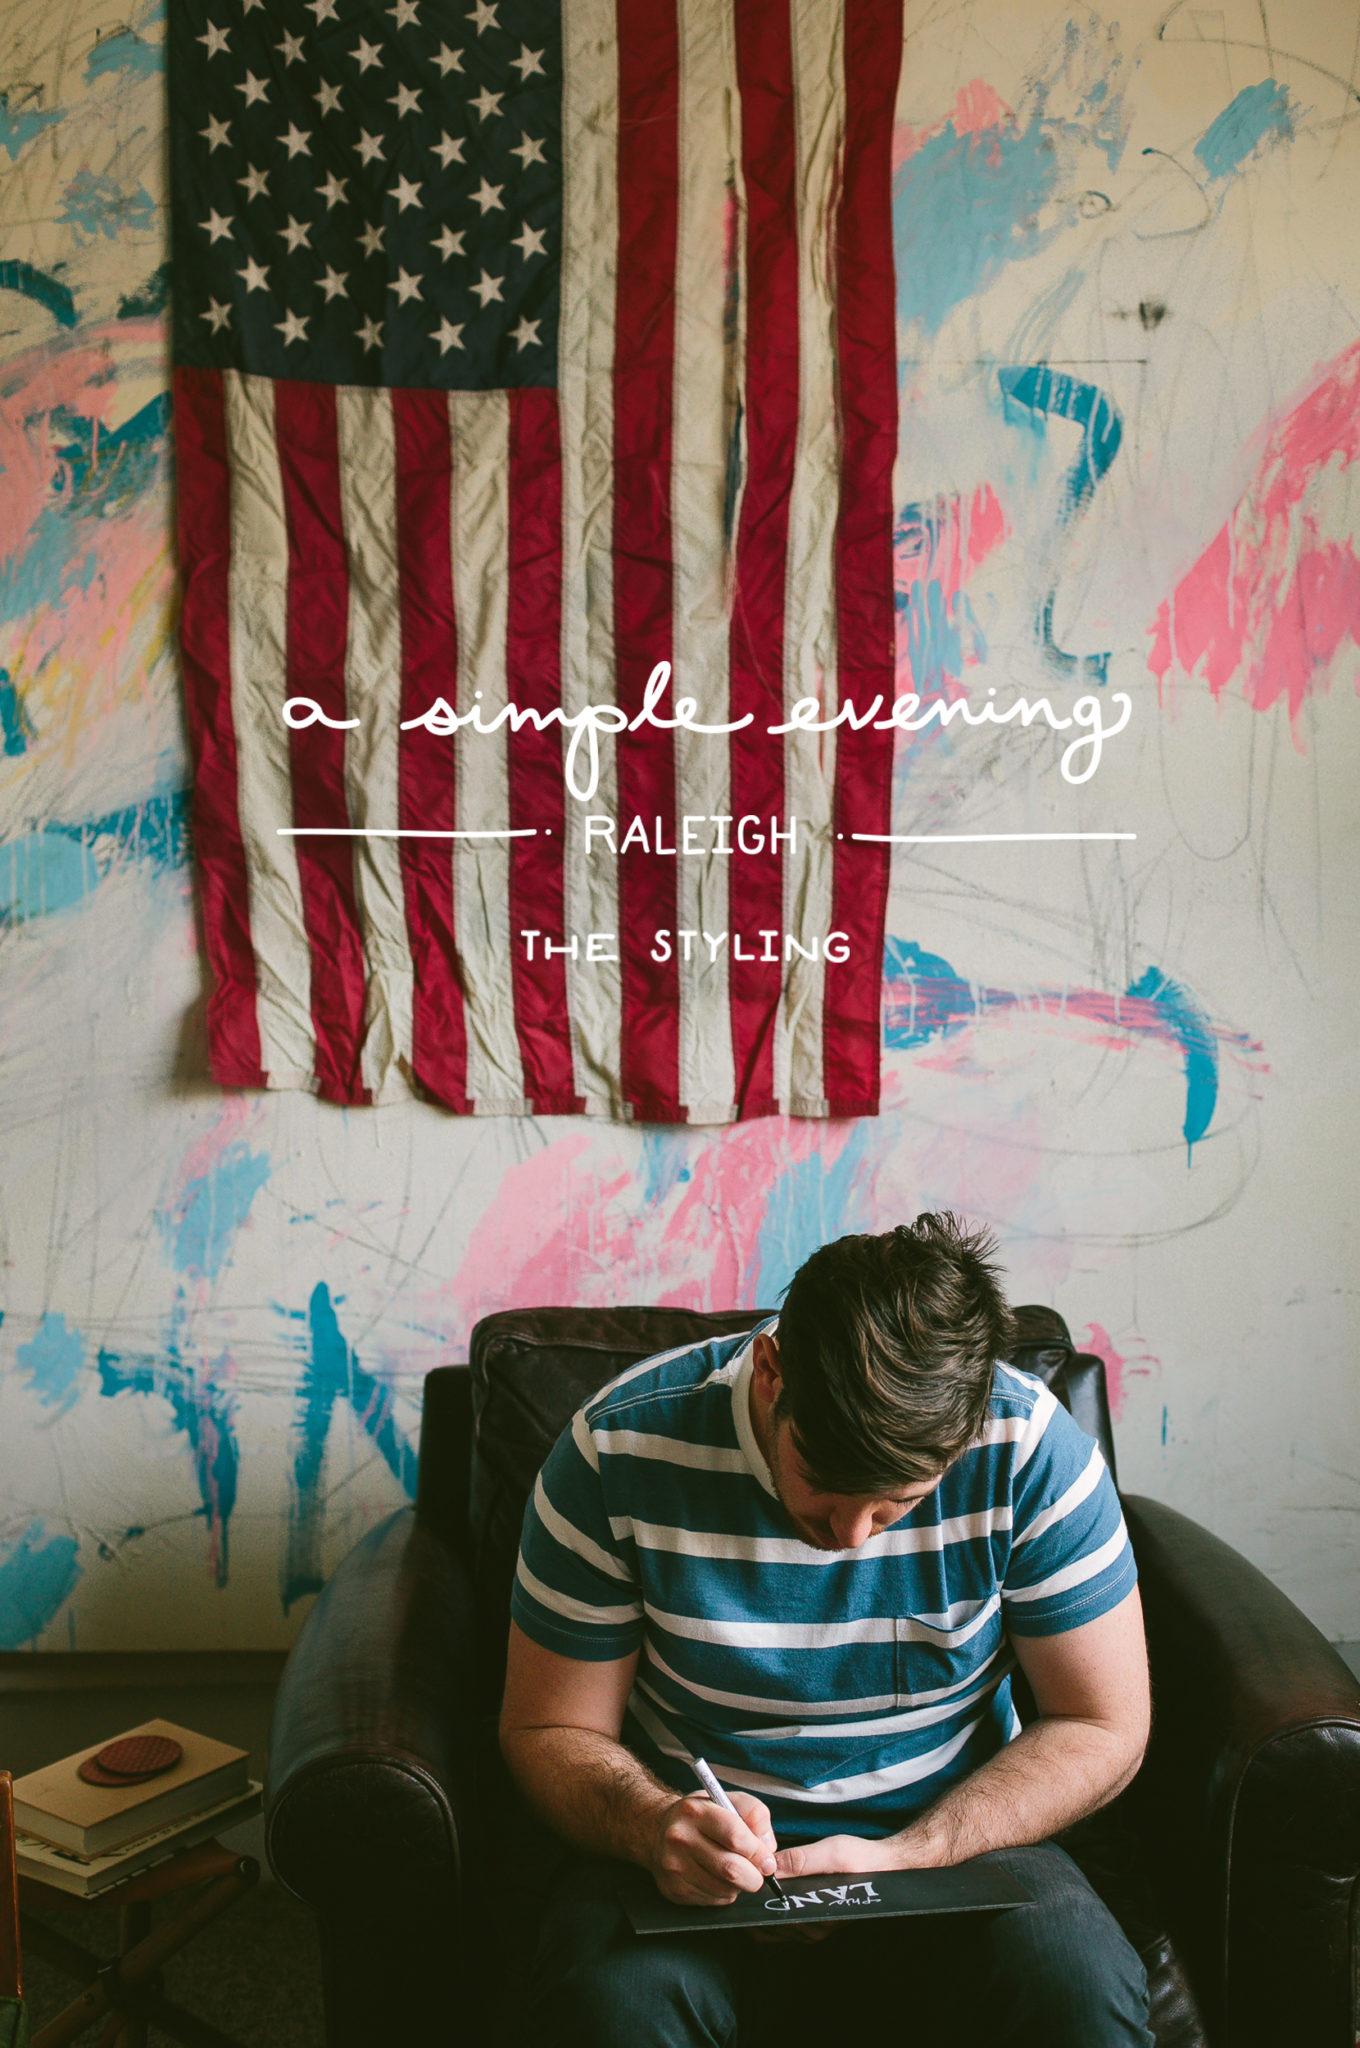 Simple Evening: Raliegh Styling with Jenn Elliott Blake   The Fresh Exchange